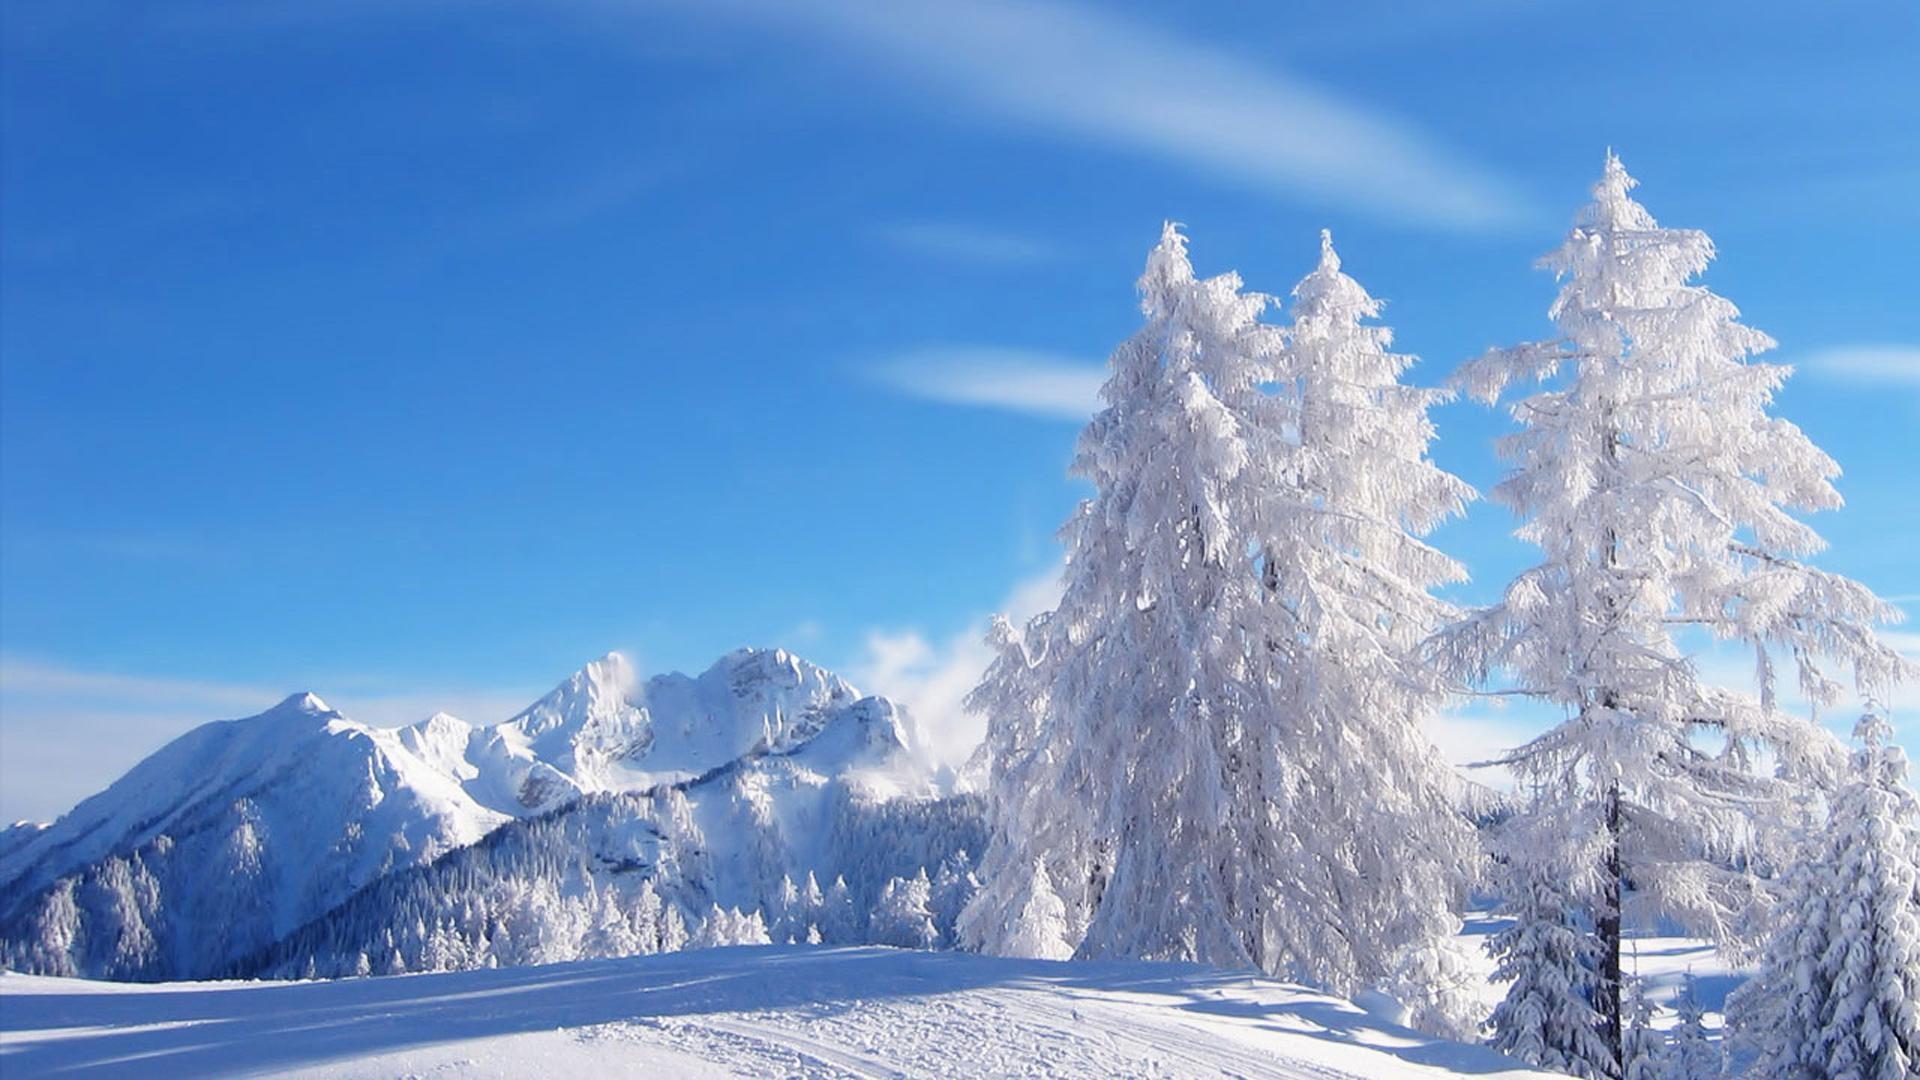 HD-Winter-Background-Wallpaper